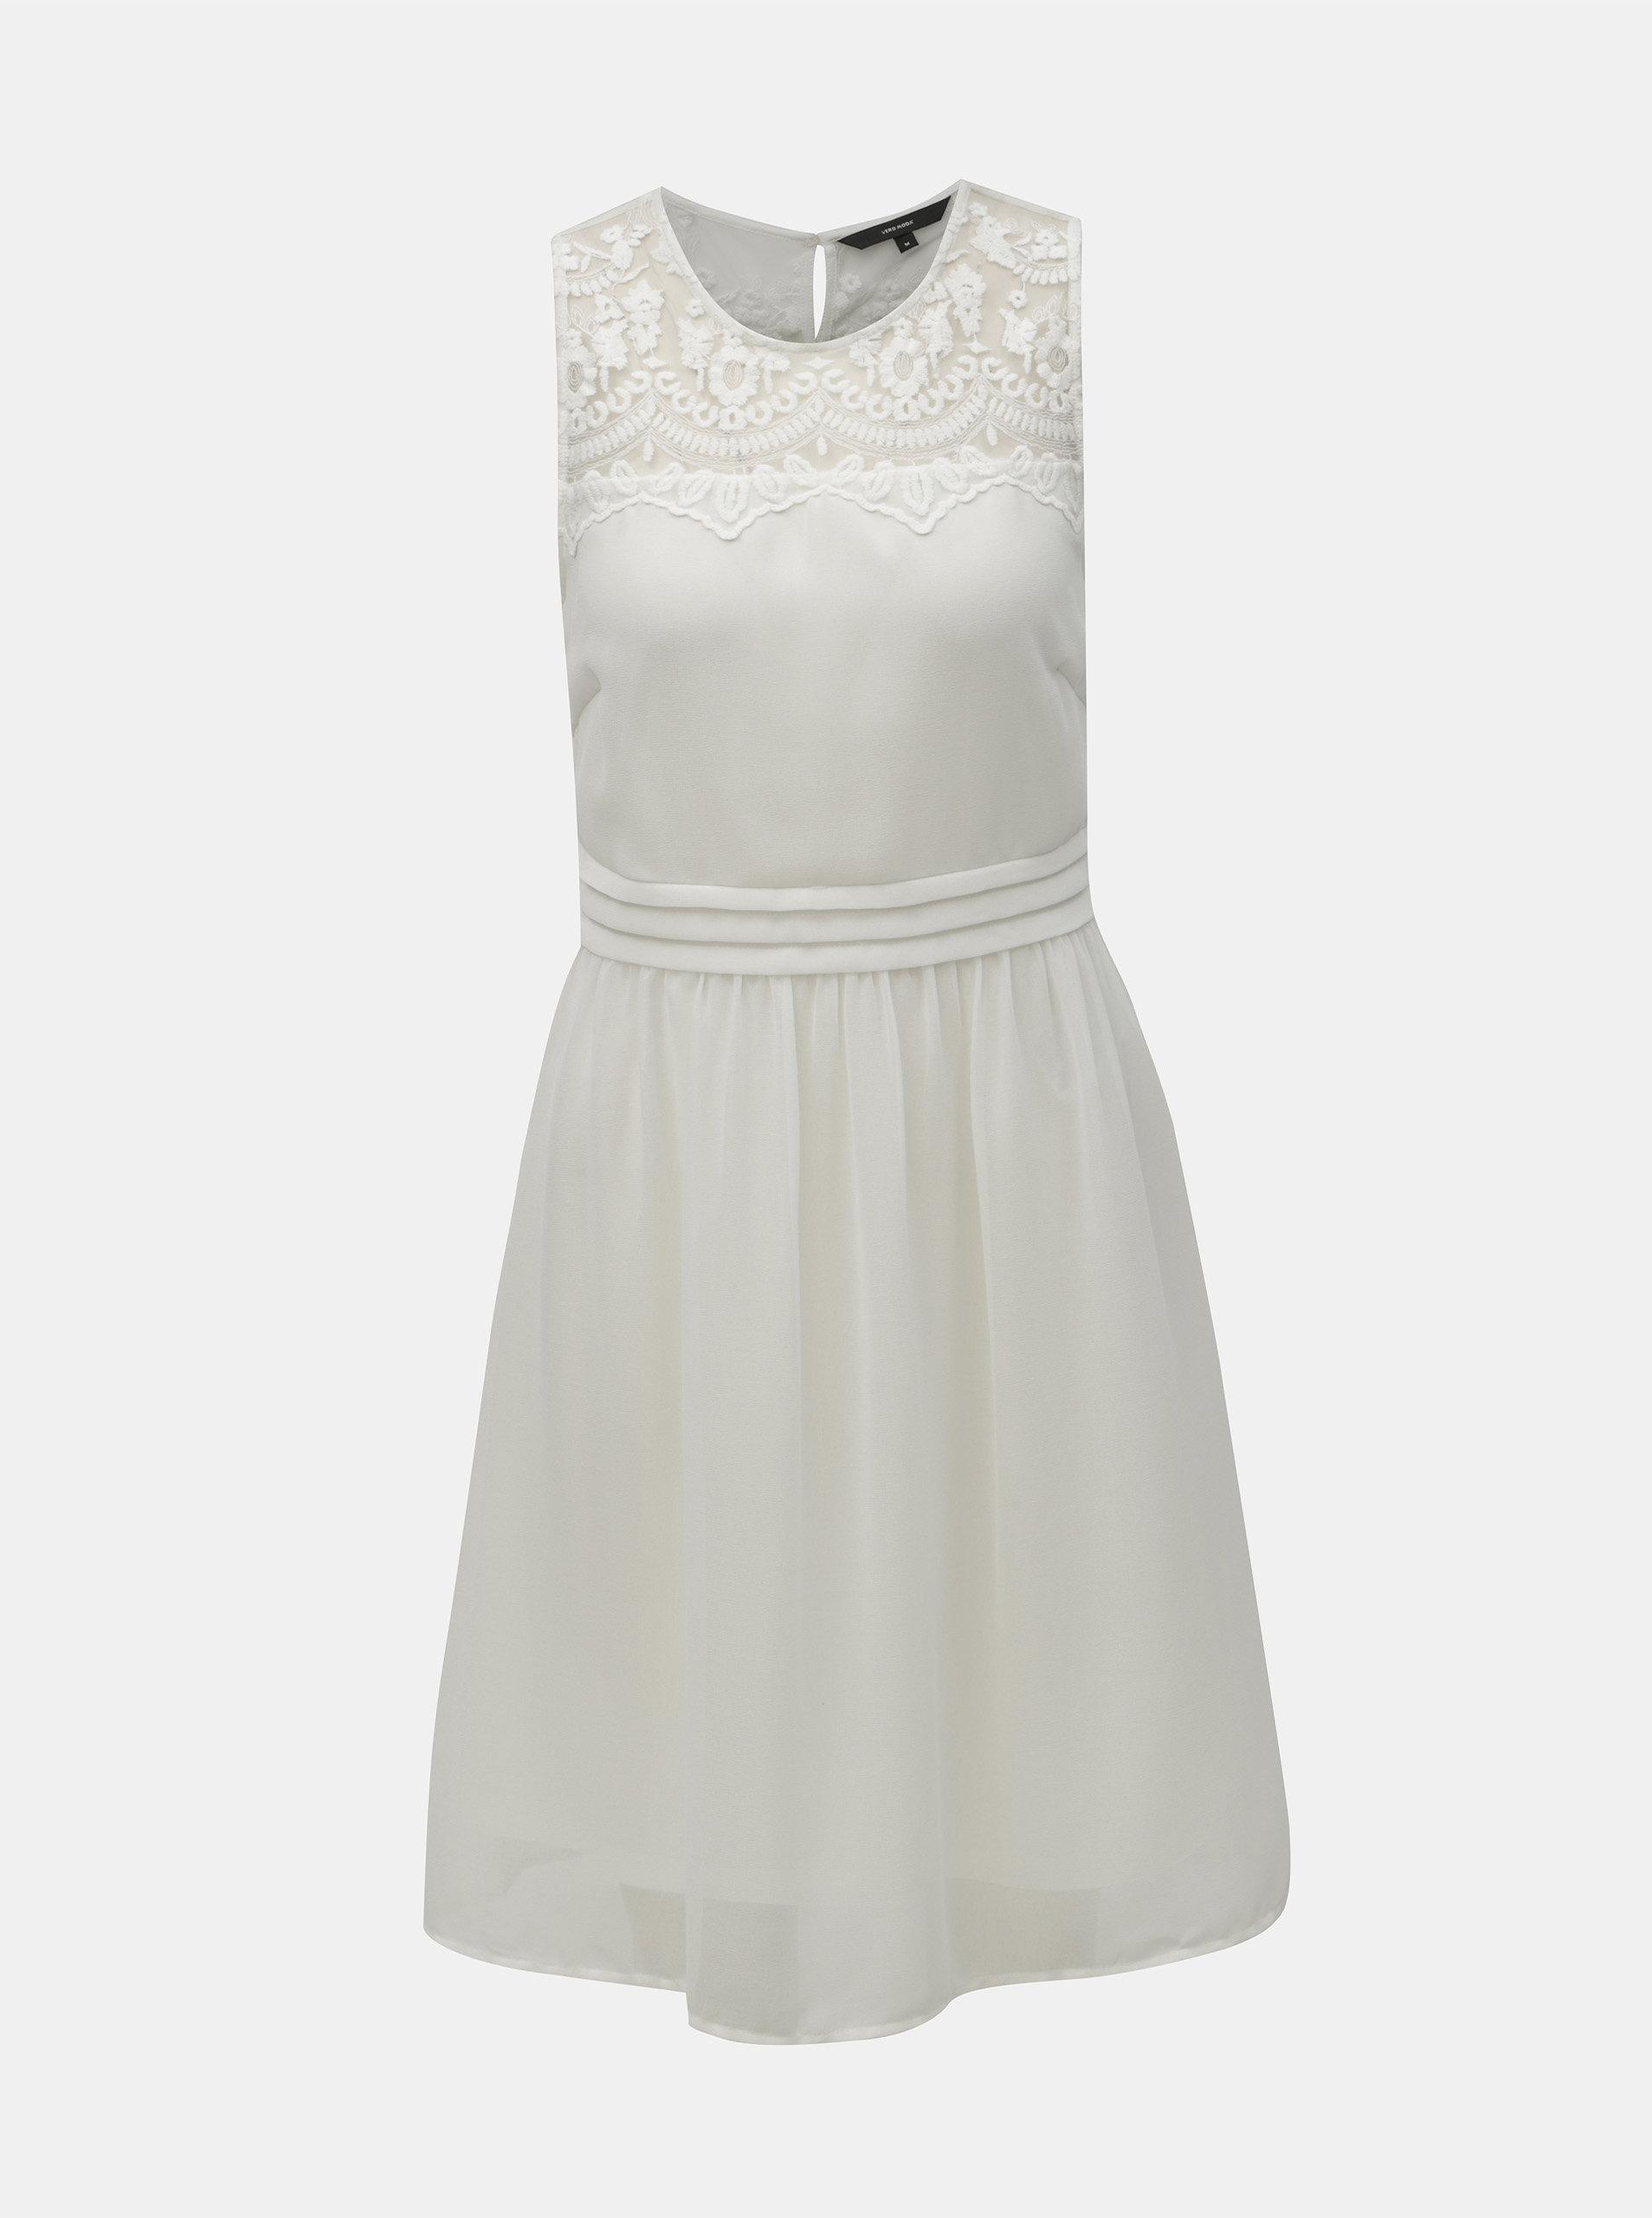 2568f23b9819 Biele šaty s čipkou VERO MODA Vanessa ...